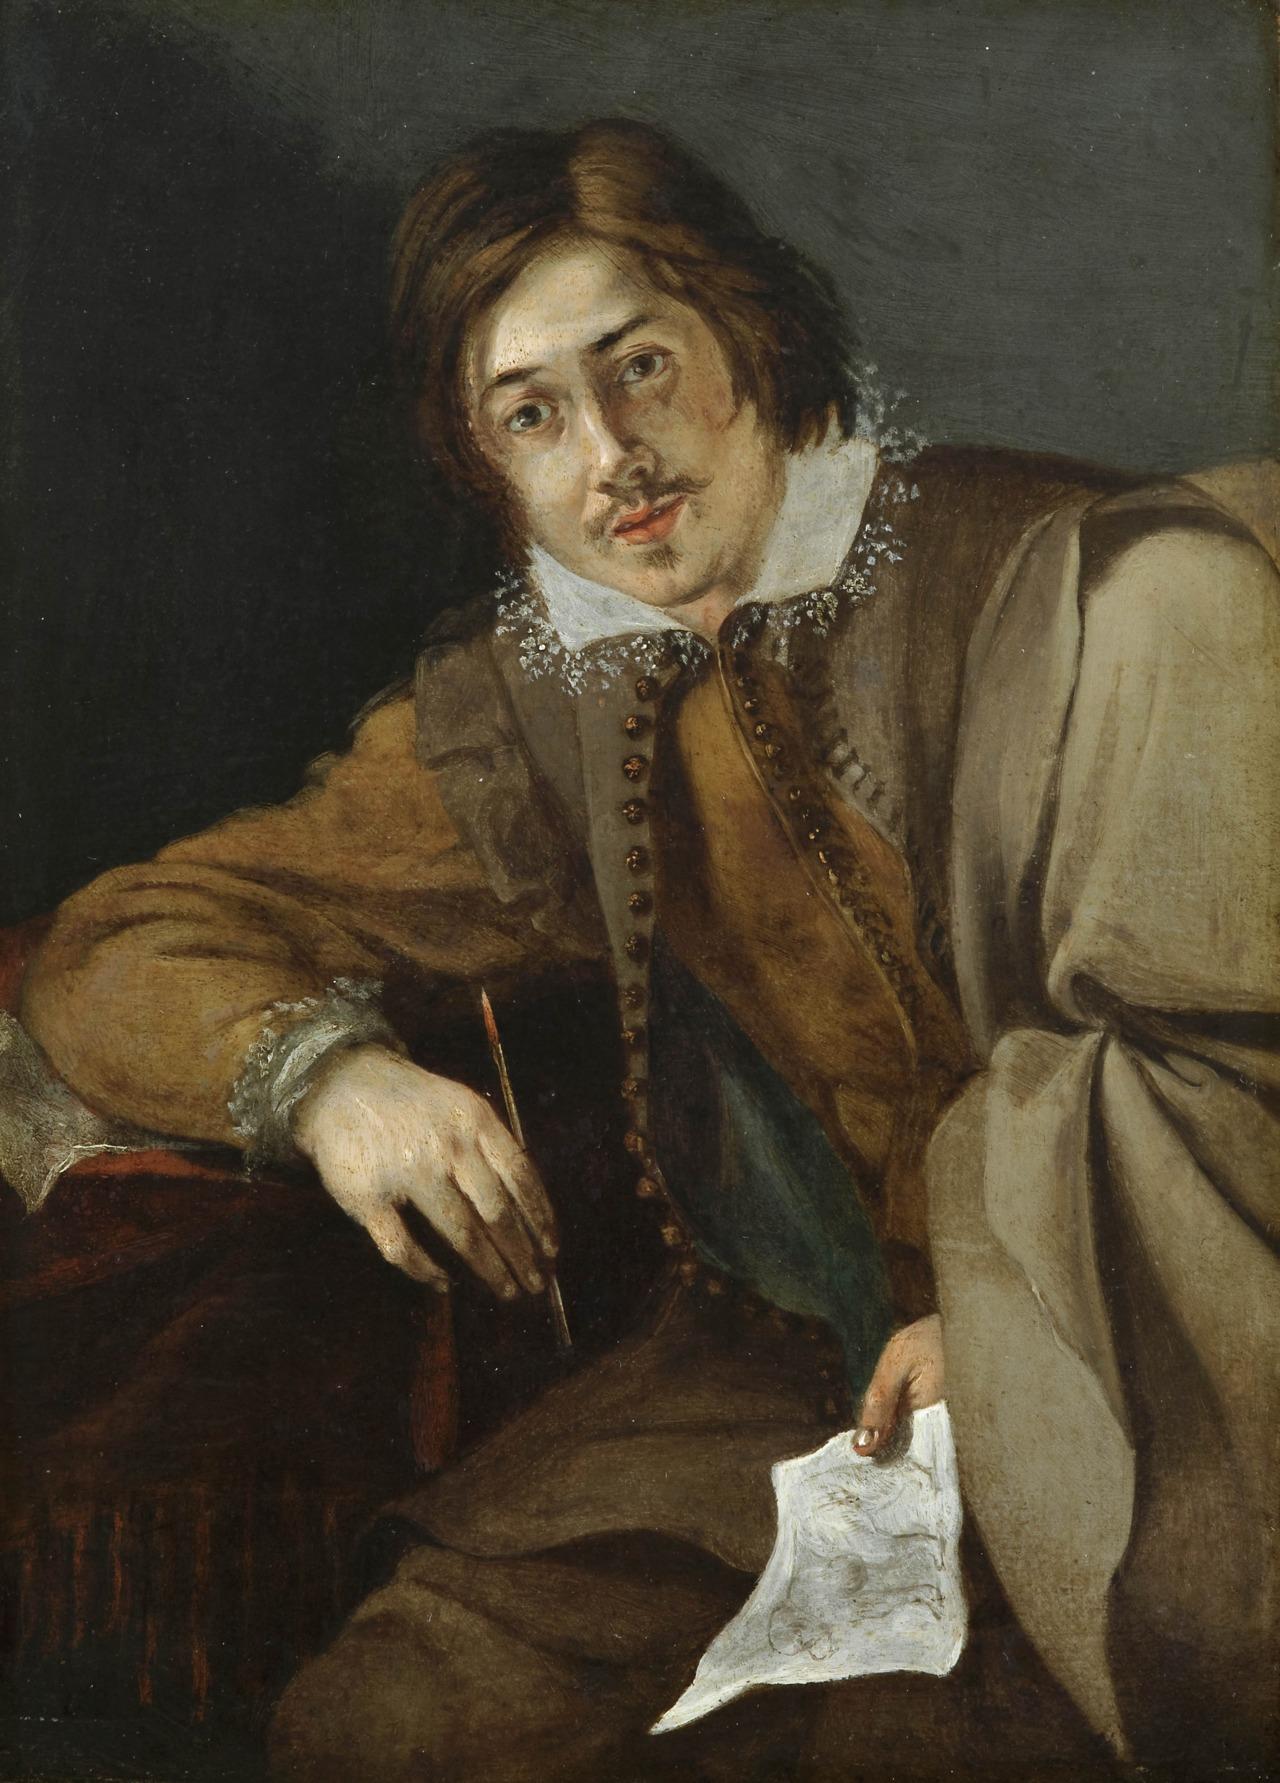 17th century man 2